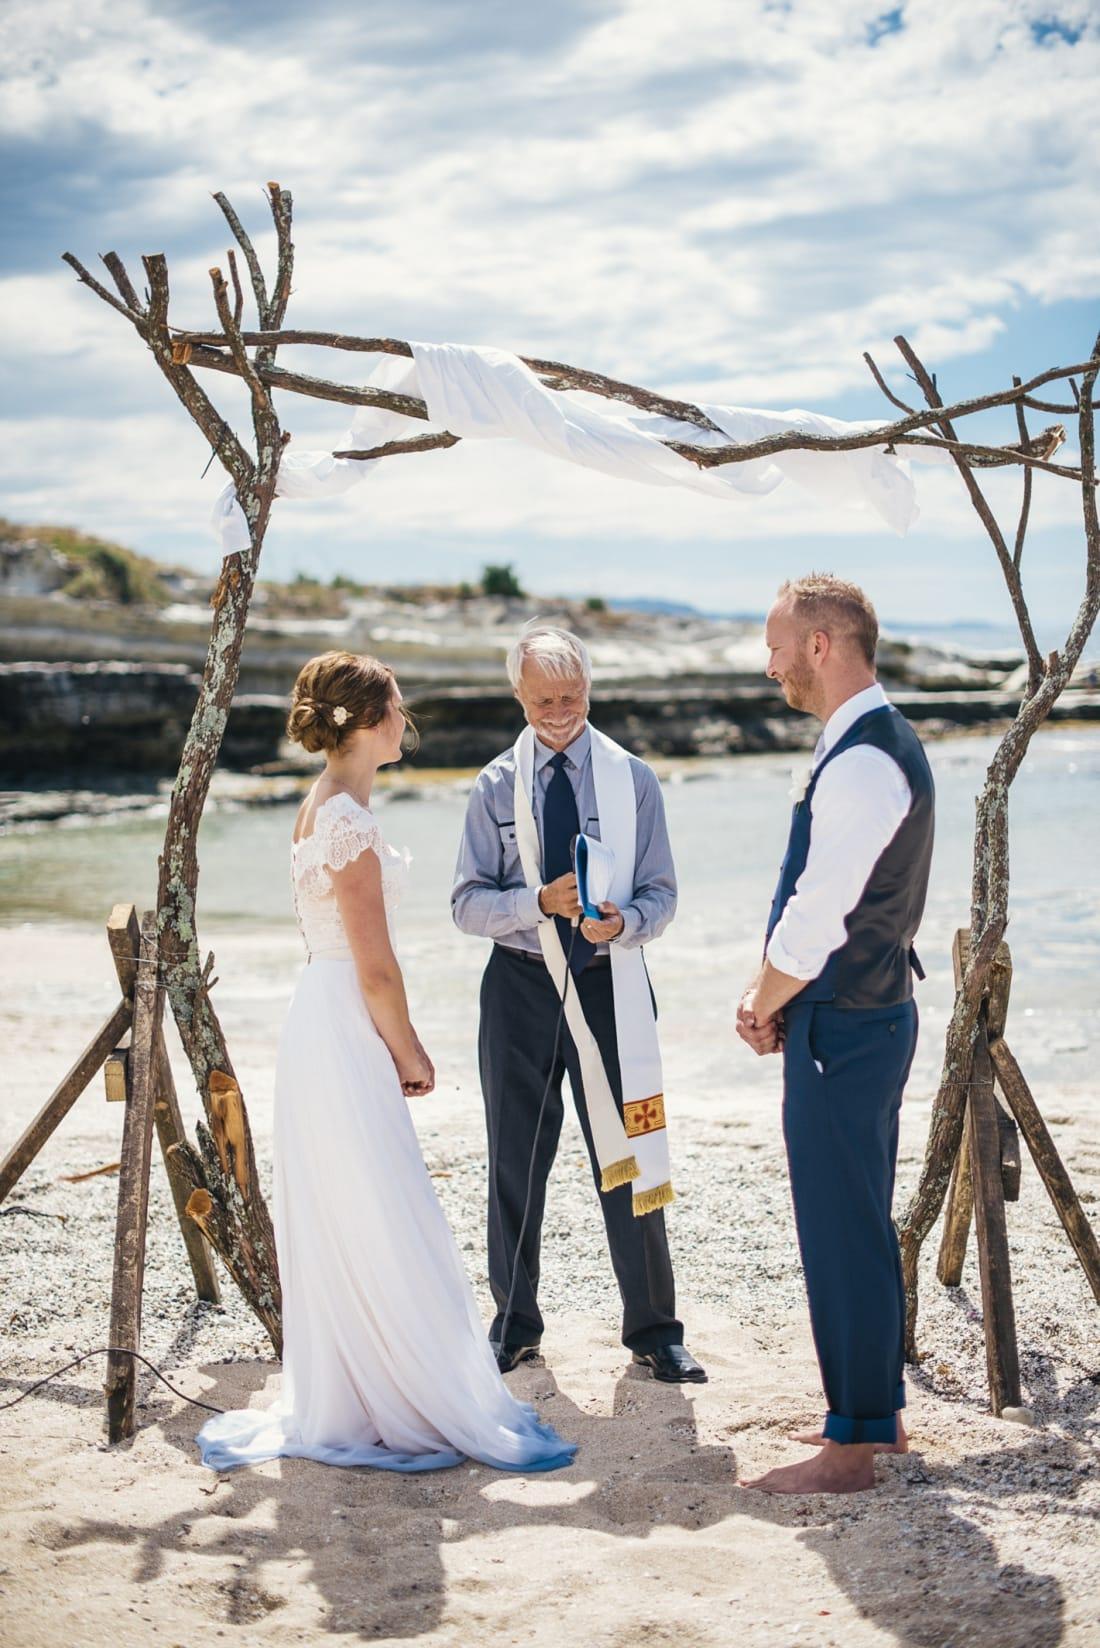 Suzy & Alan, Mahia Beach Wedding, Hawke's Bay | meredithlord.com